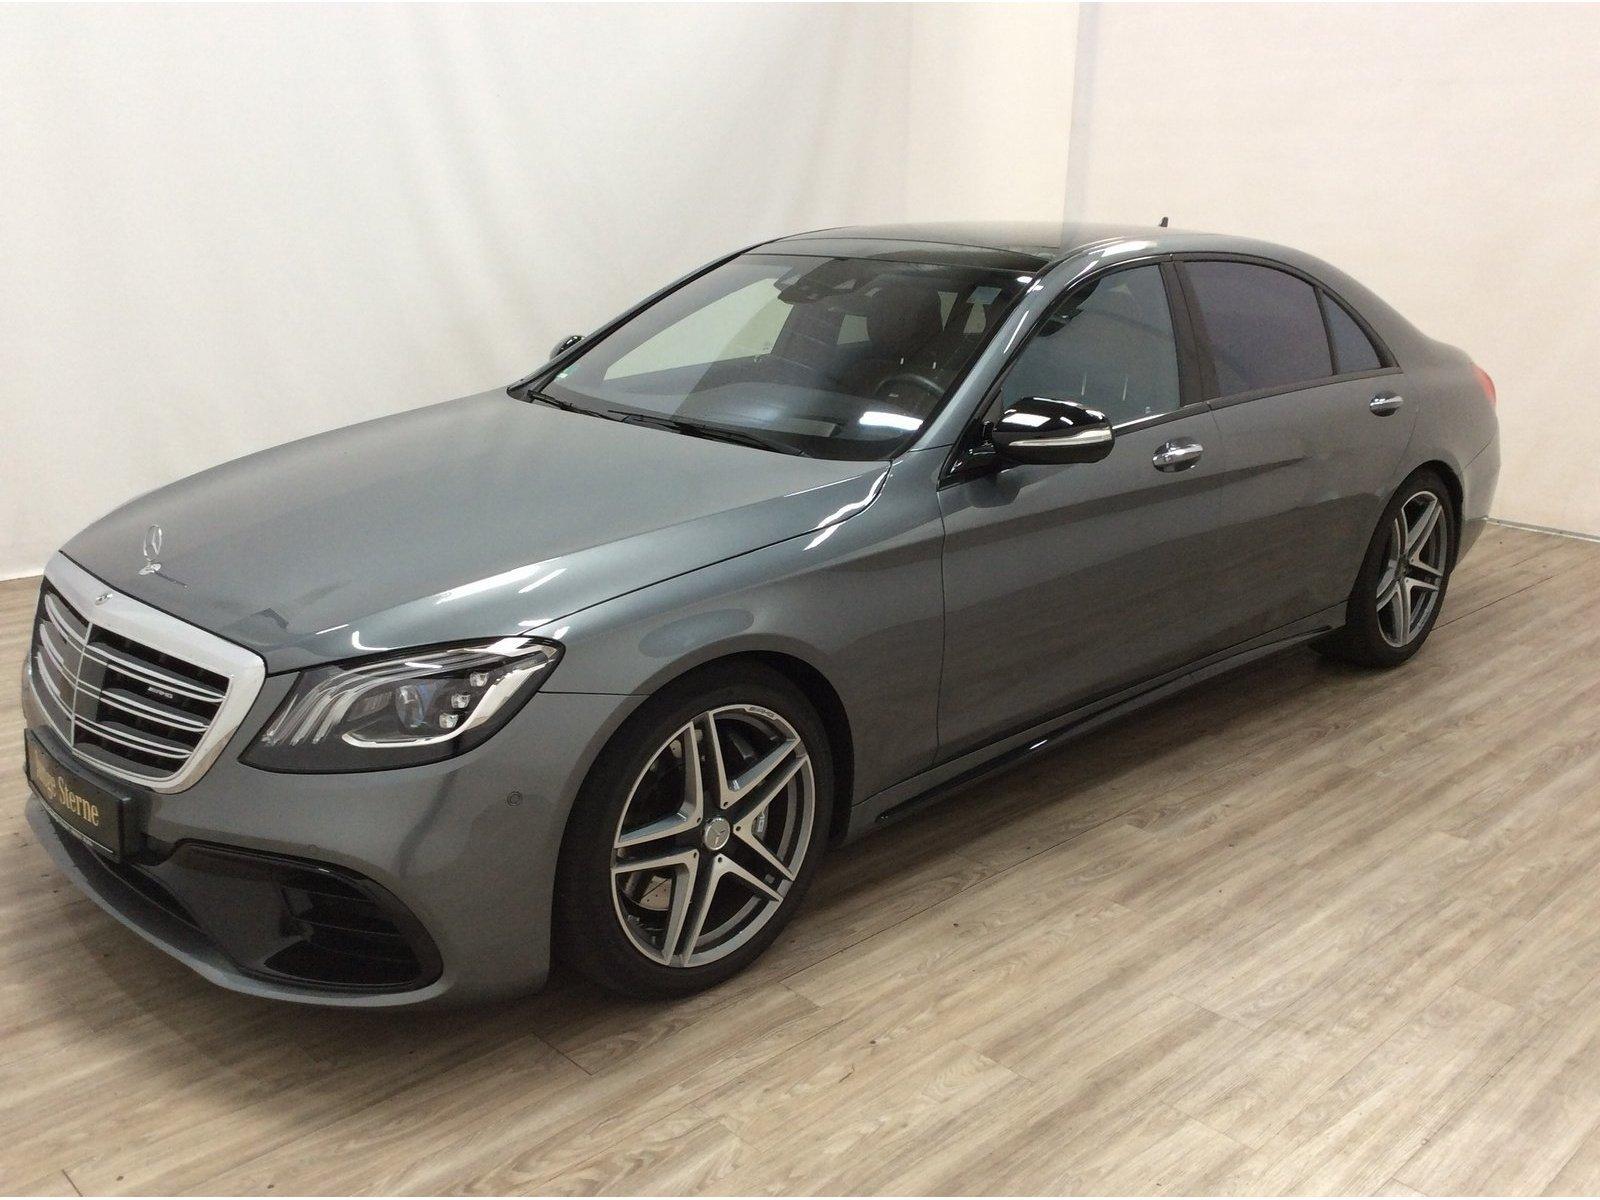 Mercedes-Benz S 63 AMG 4M lang Pano*Distr*MULTIBEAM*Kamera*HUD, Jahr 2018, Benzin